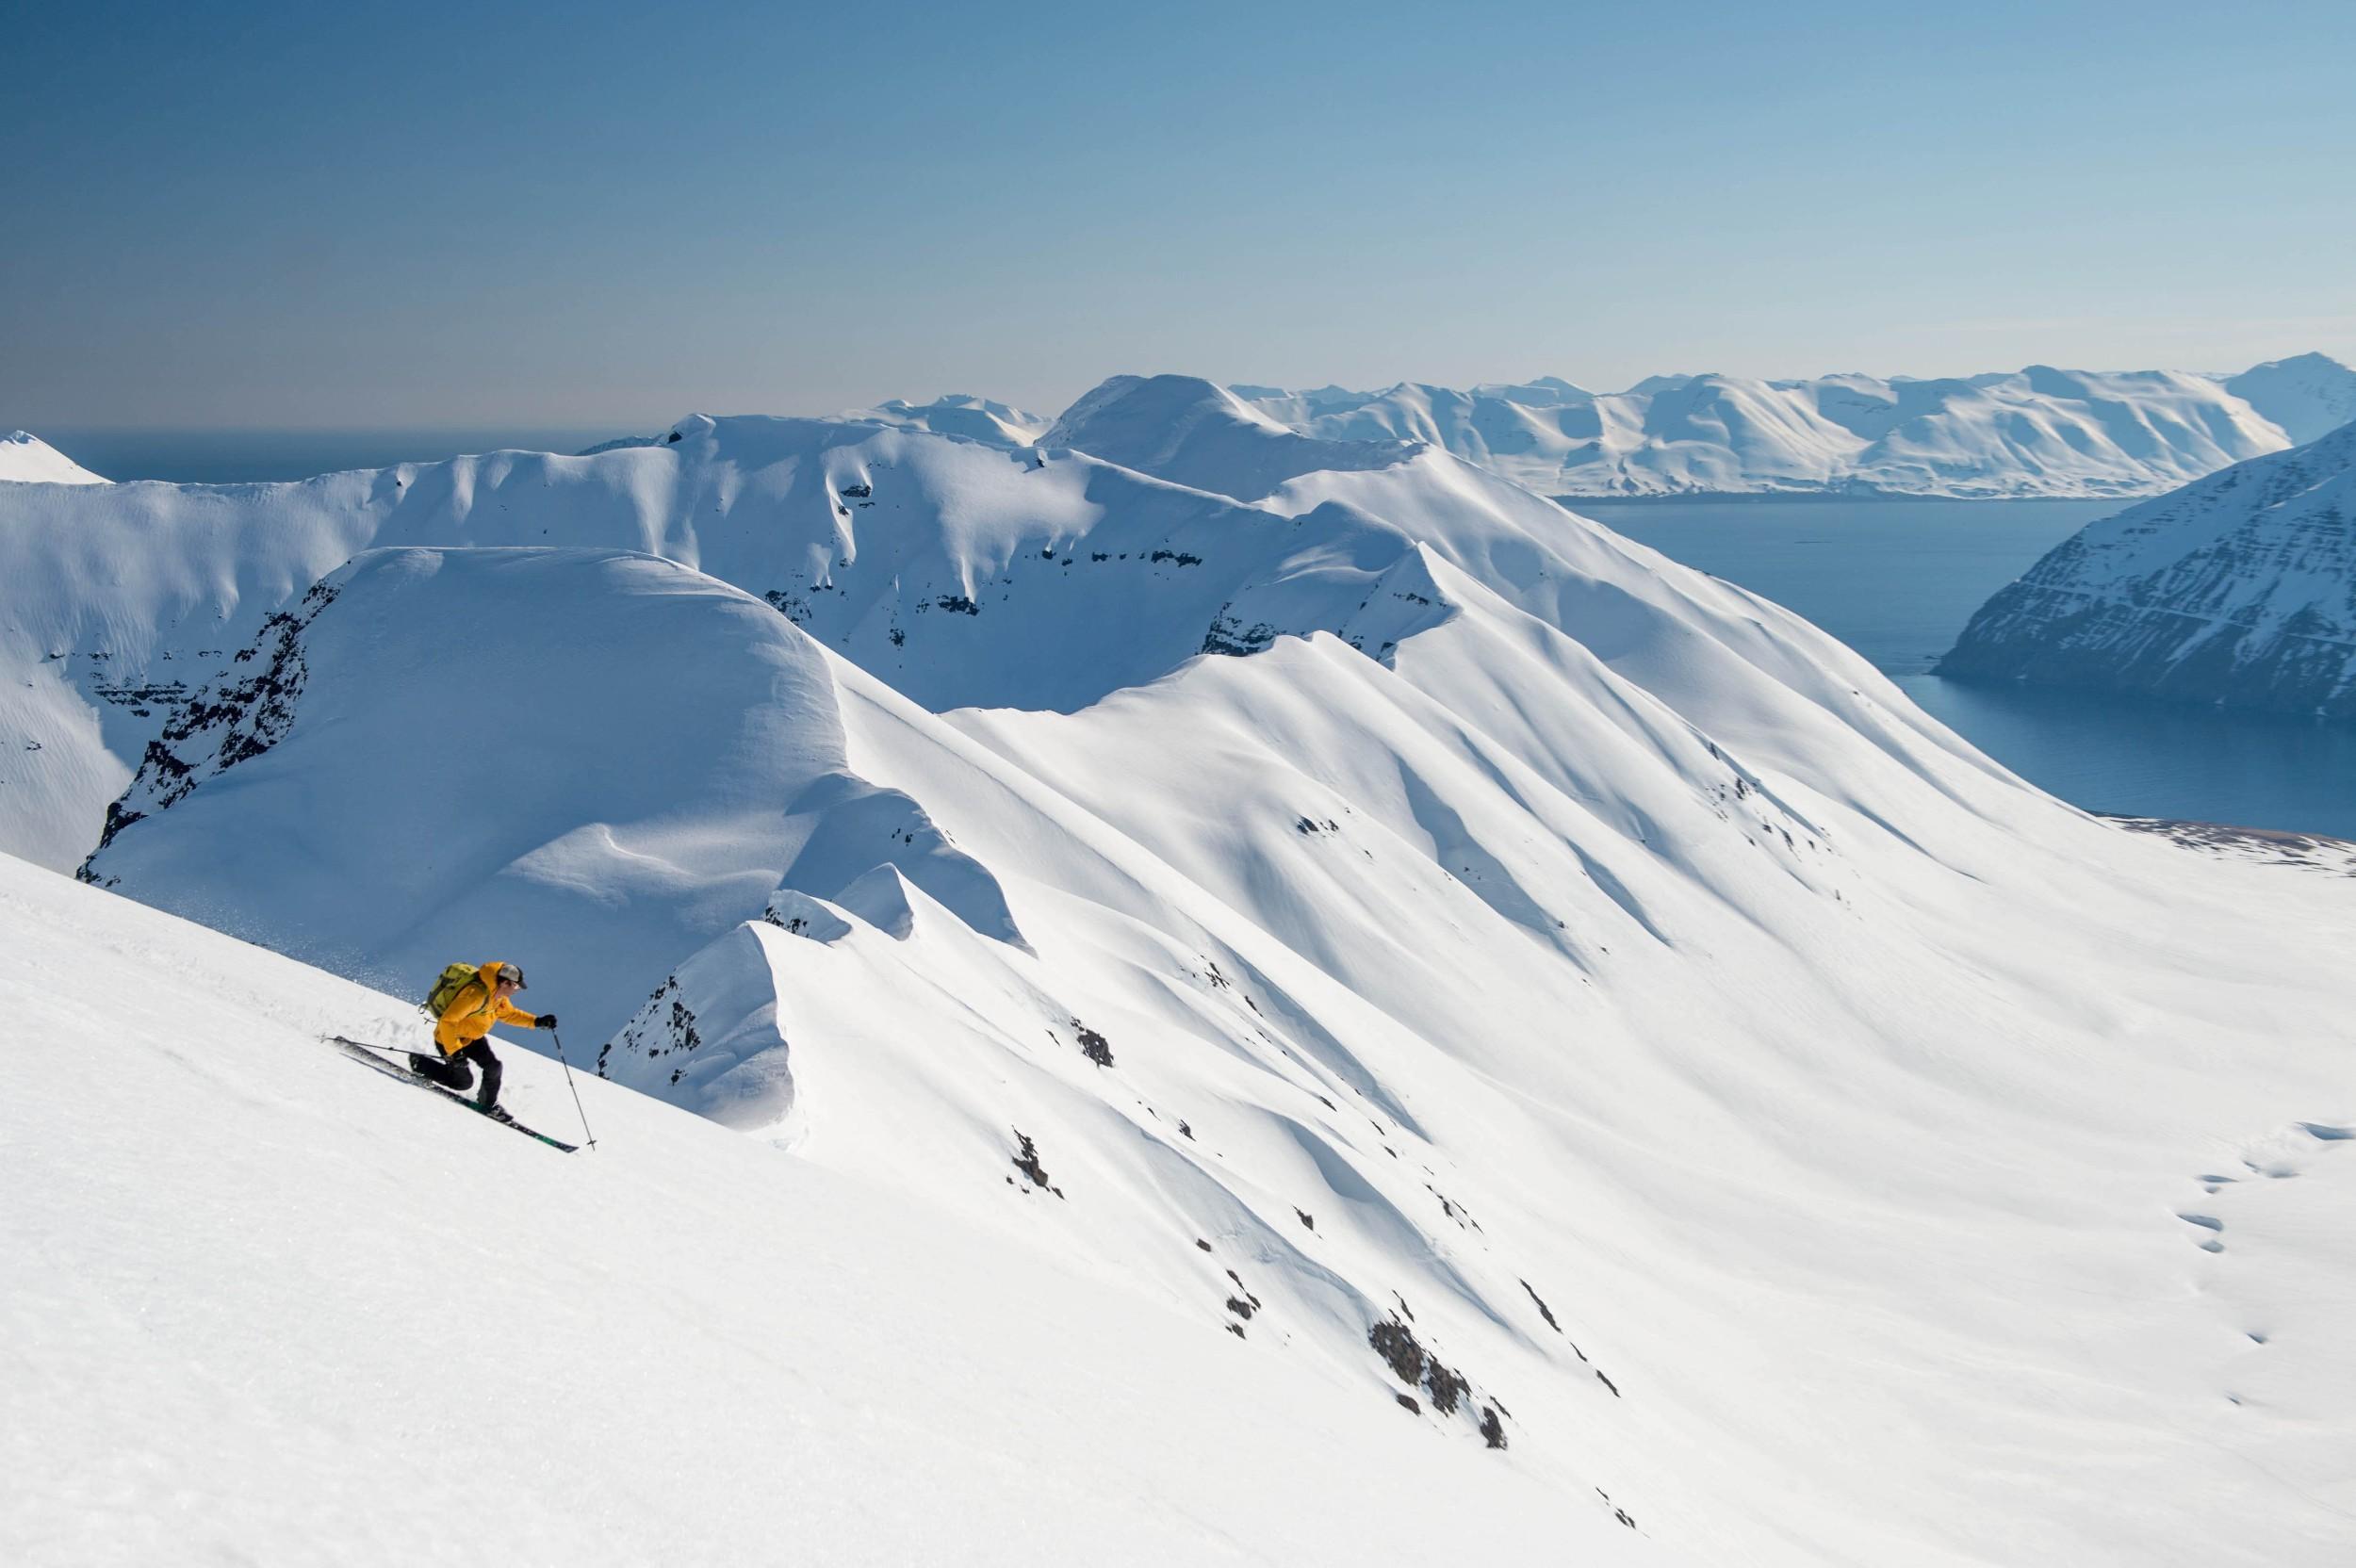 IcelandHeliSkiing14-5483.jpg